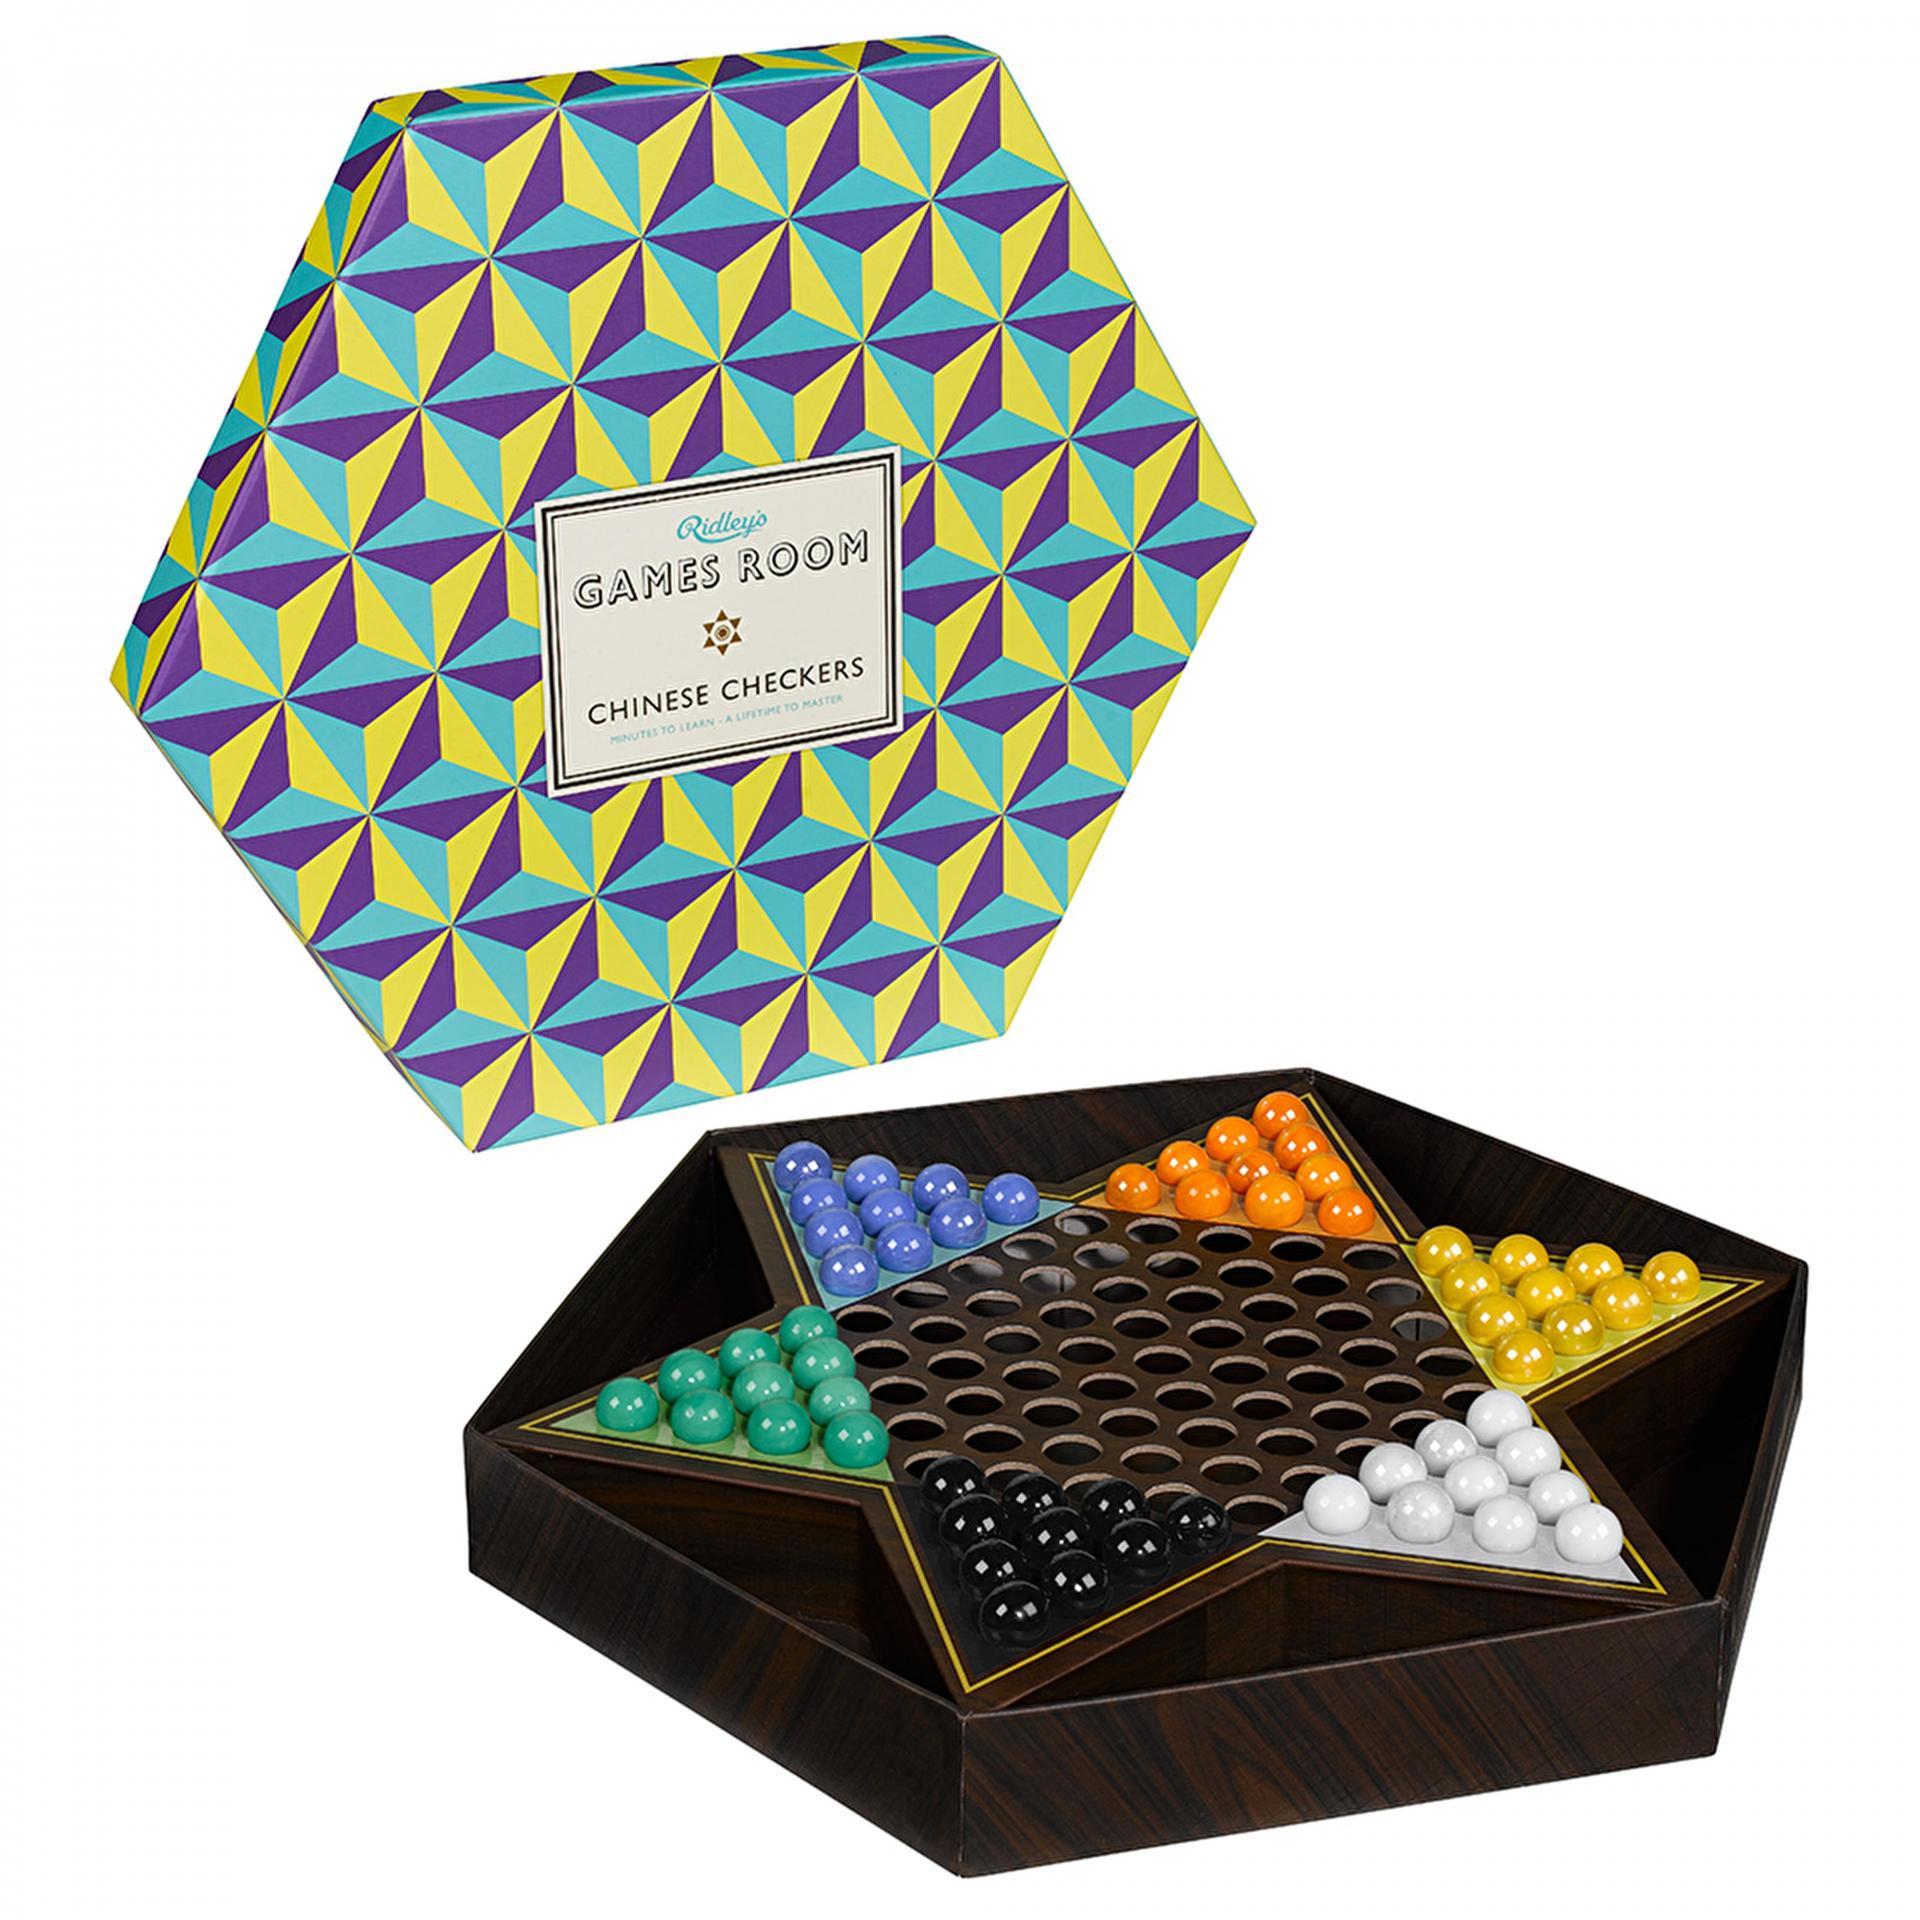 Ridley's Games Room Desková hra - čínská dáma, fialová barva, žlutá barva, multi barva, papír